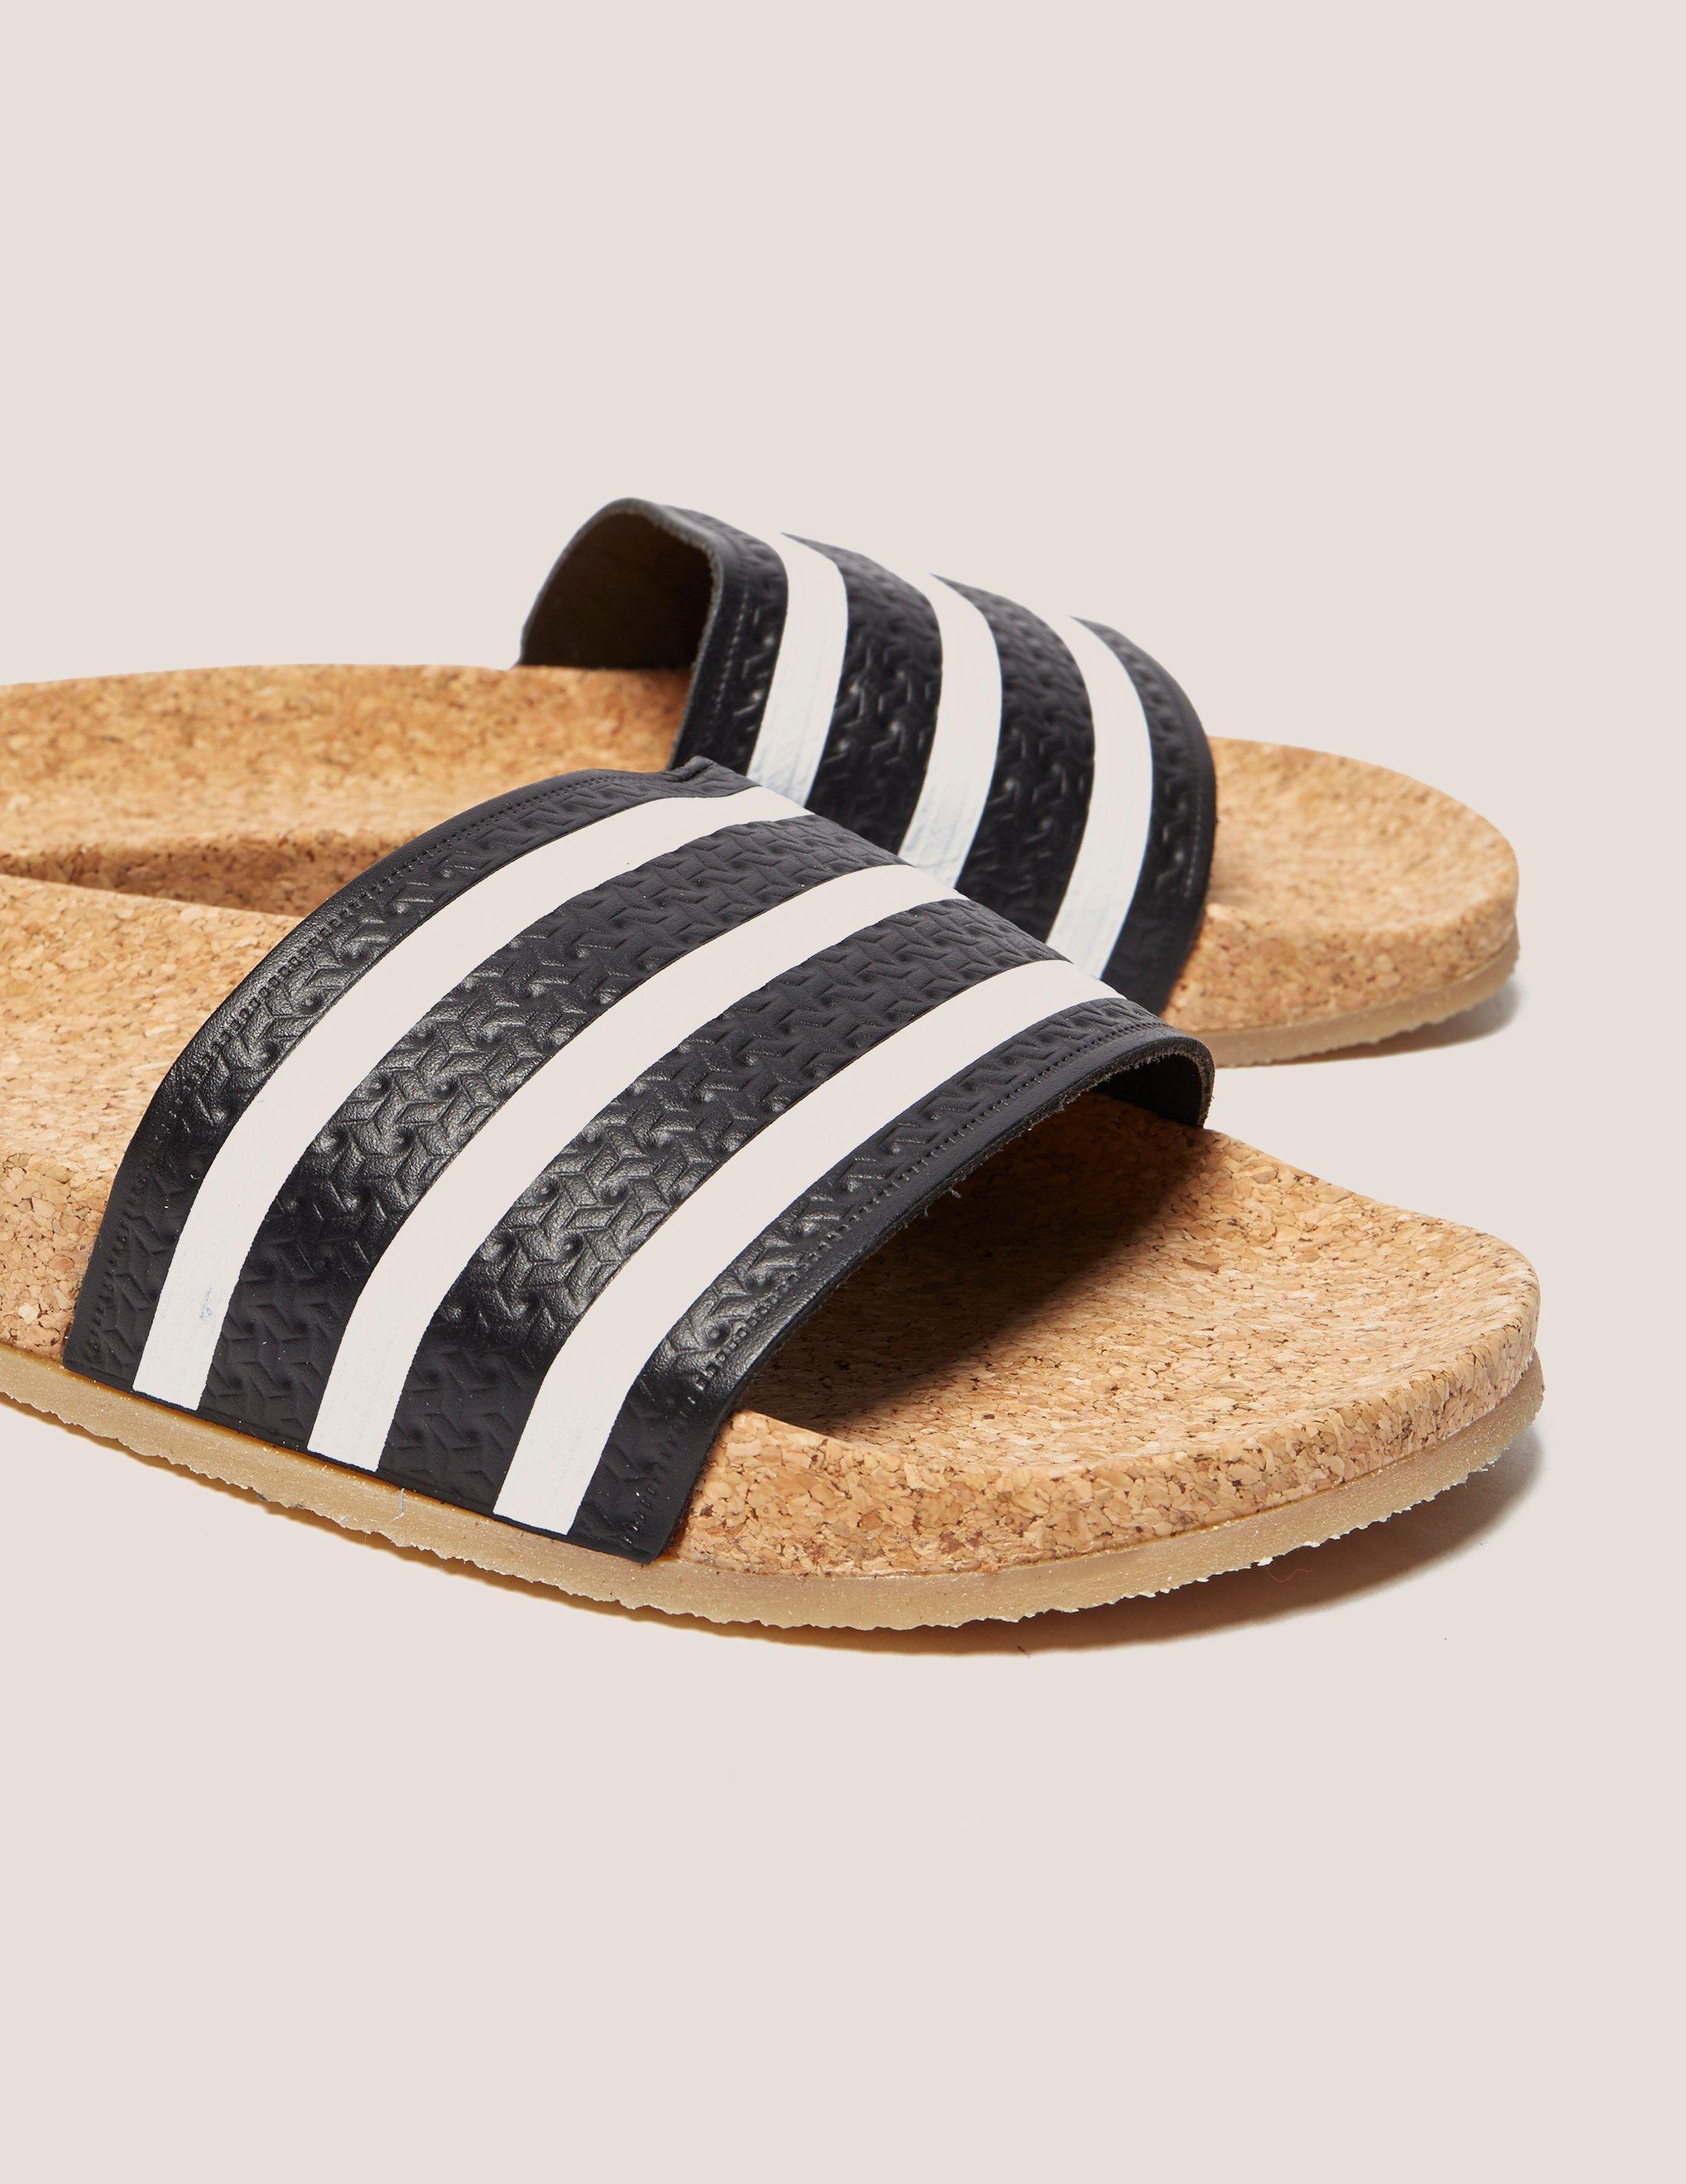 874a120804c2 Lyst - adidas Originals Adilette Cork Slides